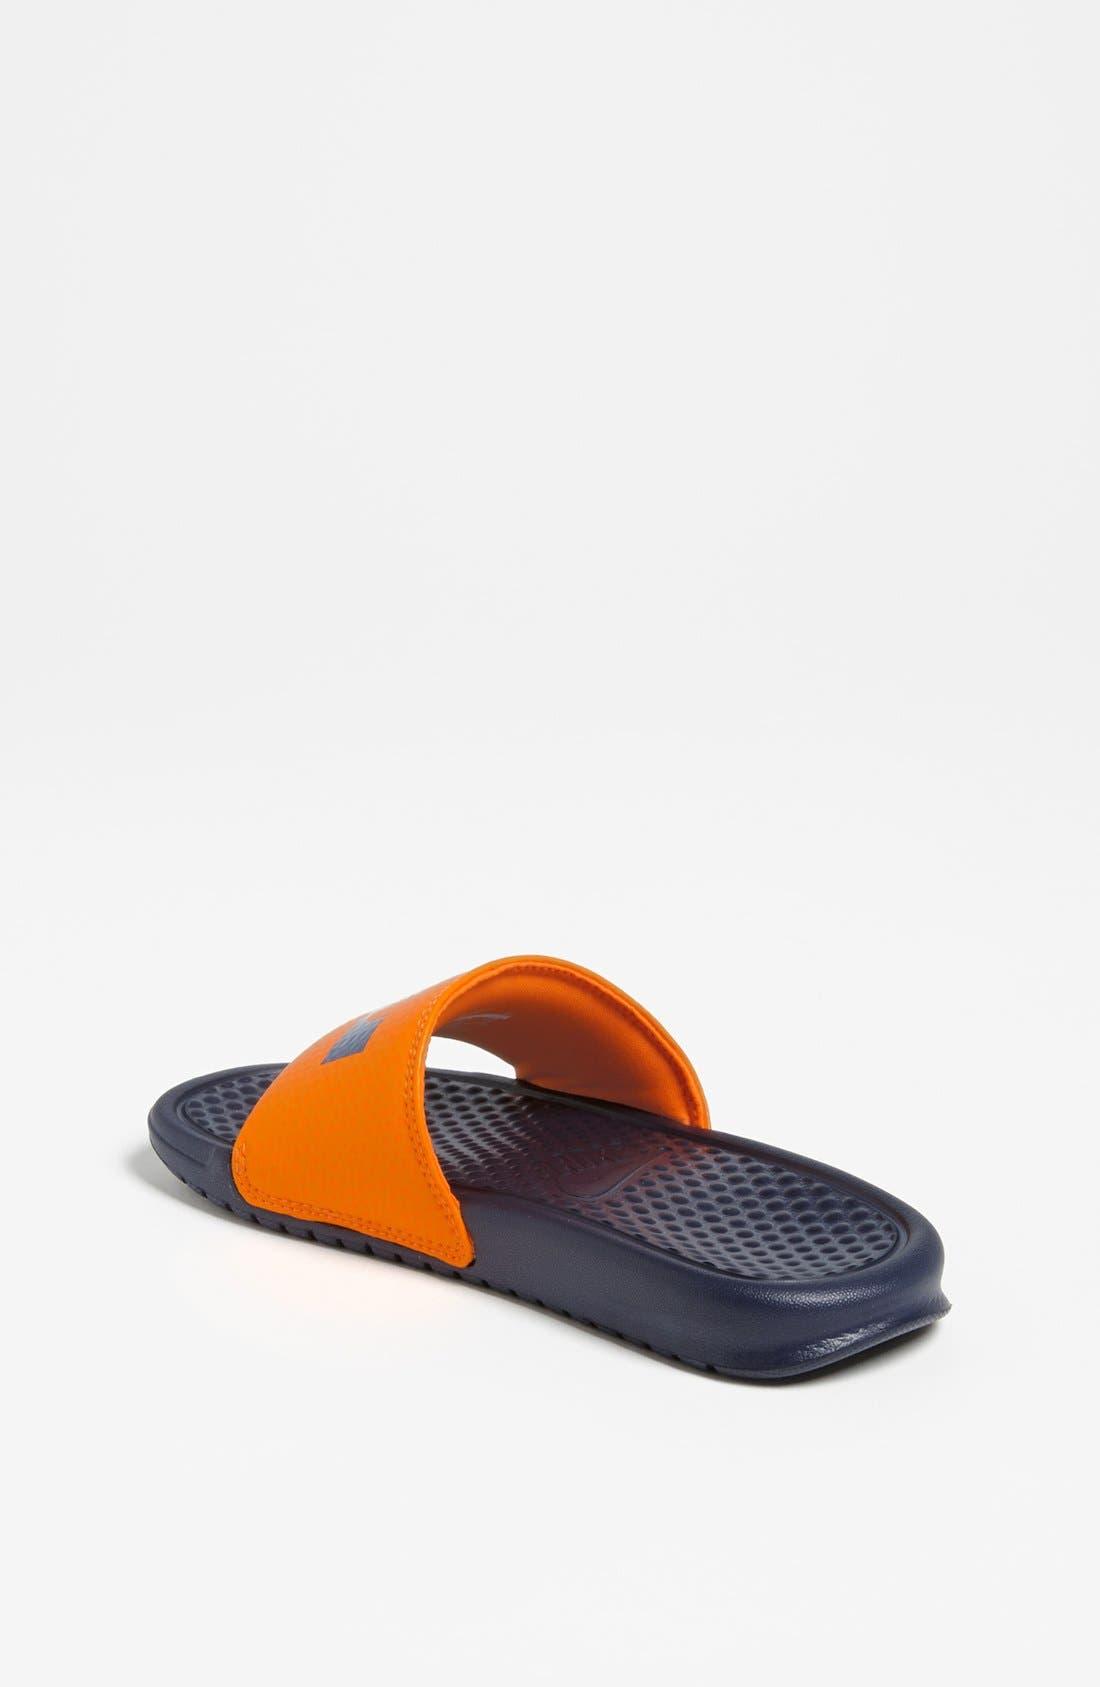 Alternate Image 2  - Nike 'Lebron James - Benassi' Sandal (Toddler, Little Kid & Big Kid)